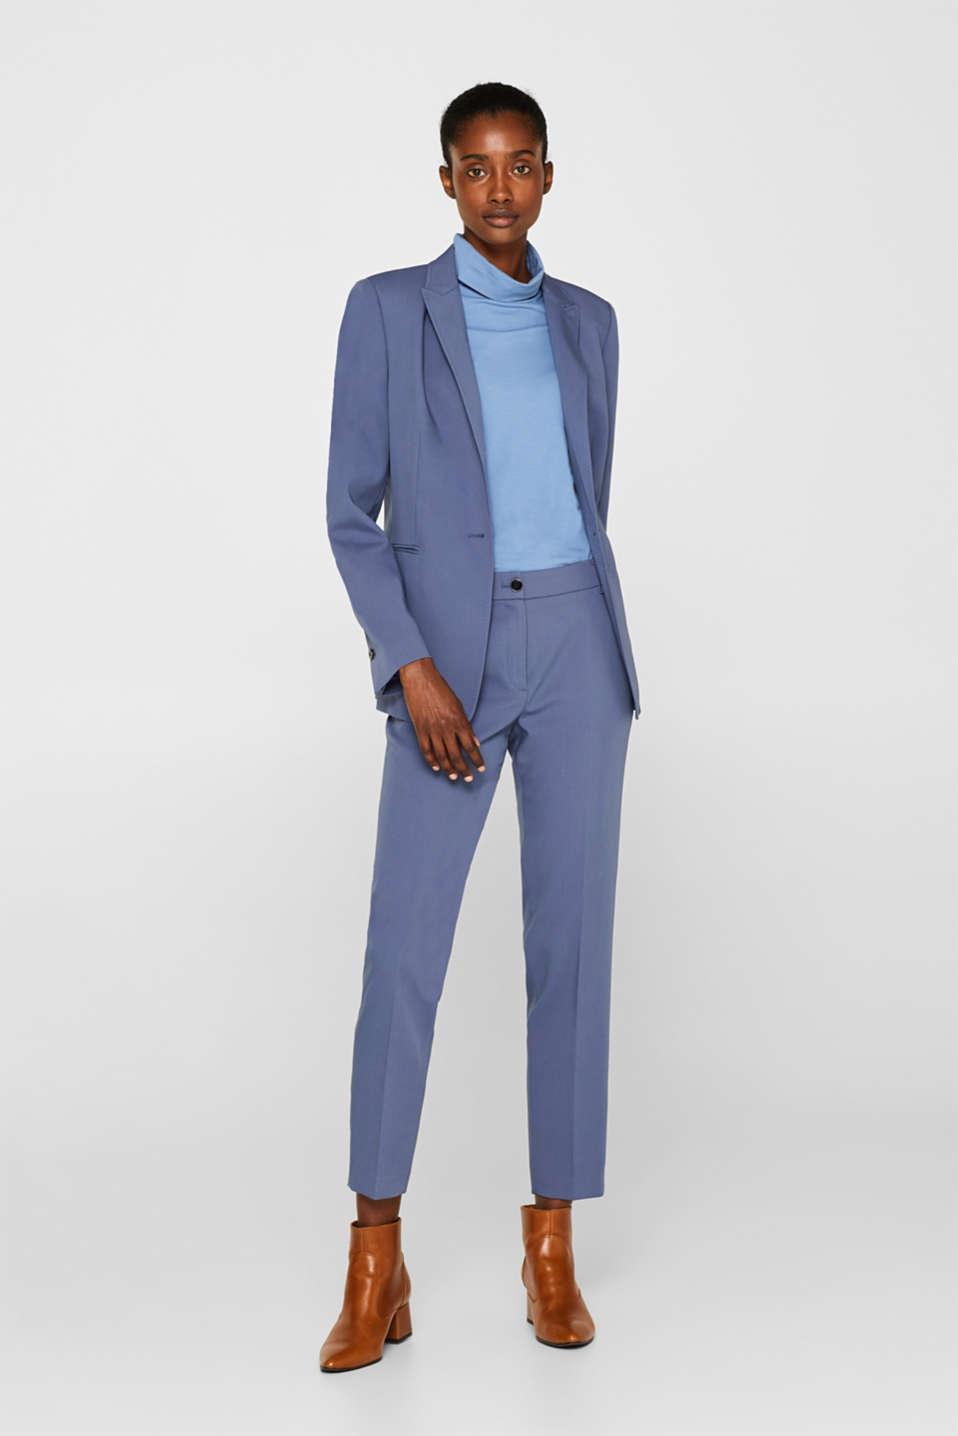 STITCHING mix + match stretch blazer, GREY BLUE 2, detail image number 1